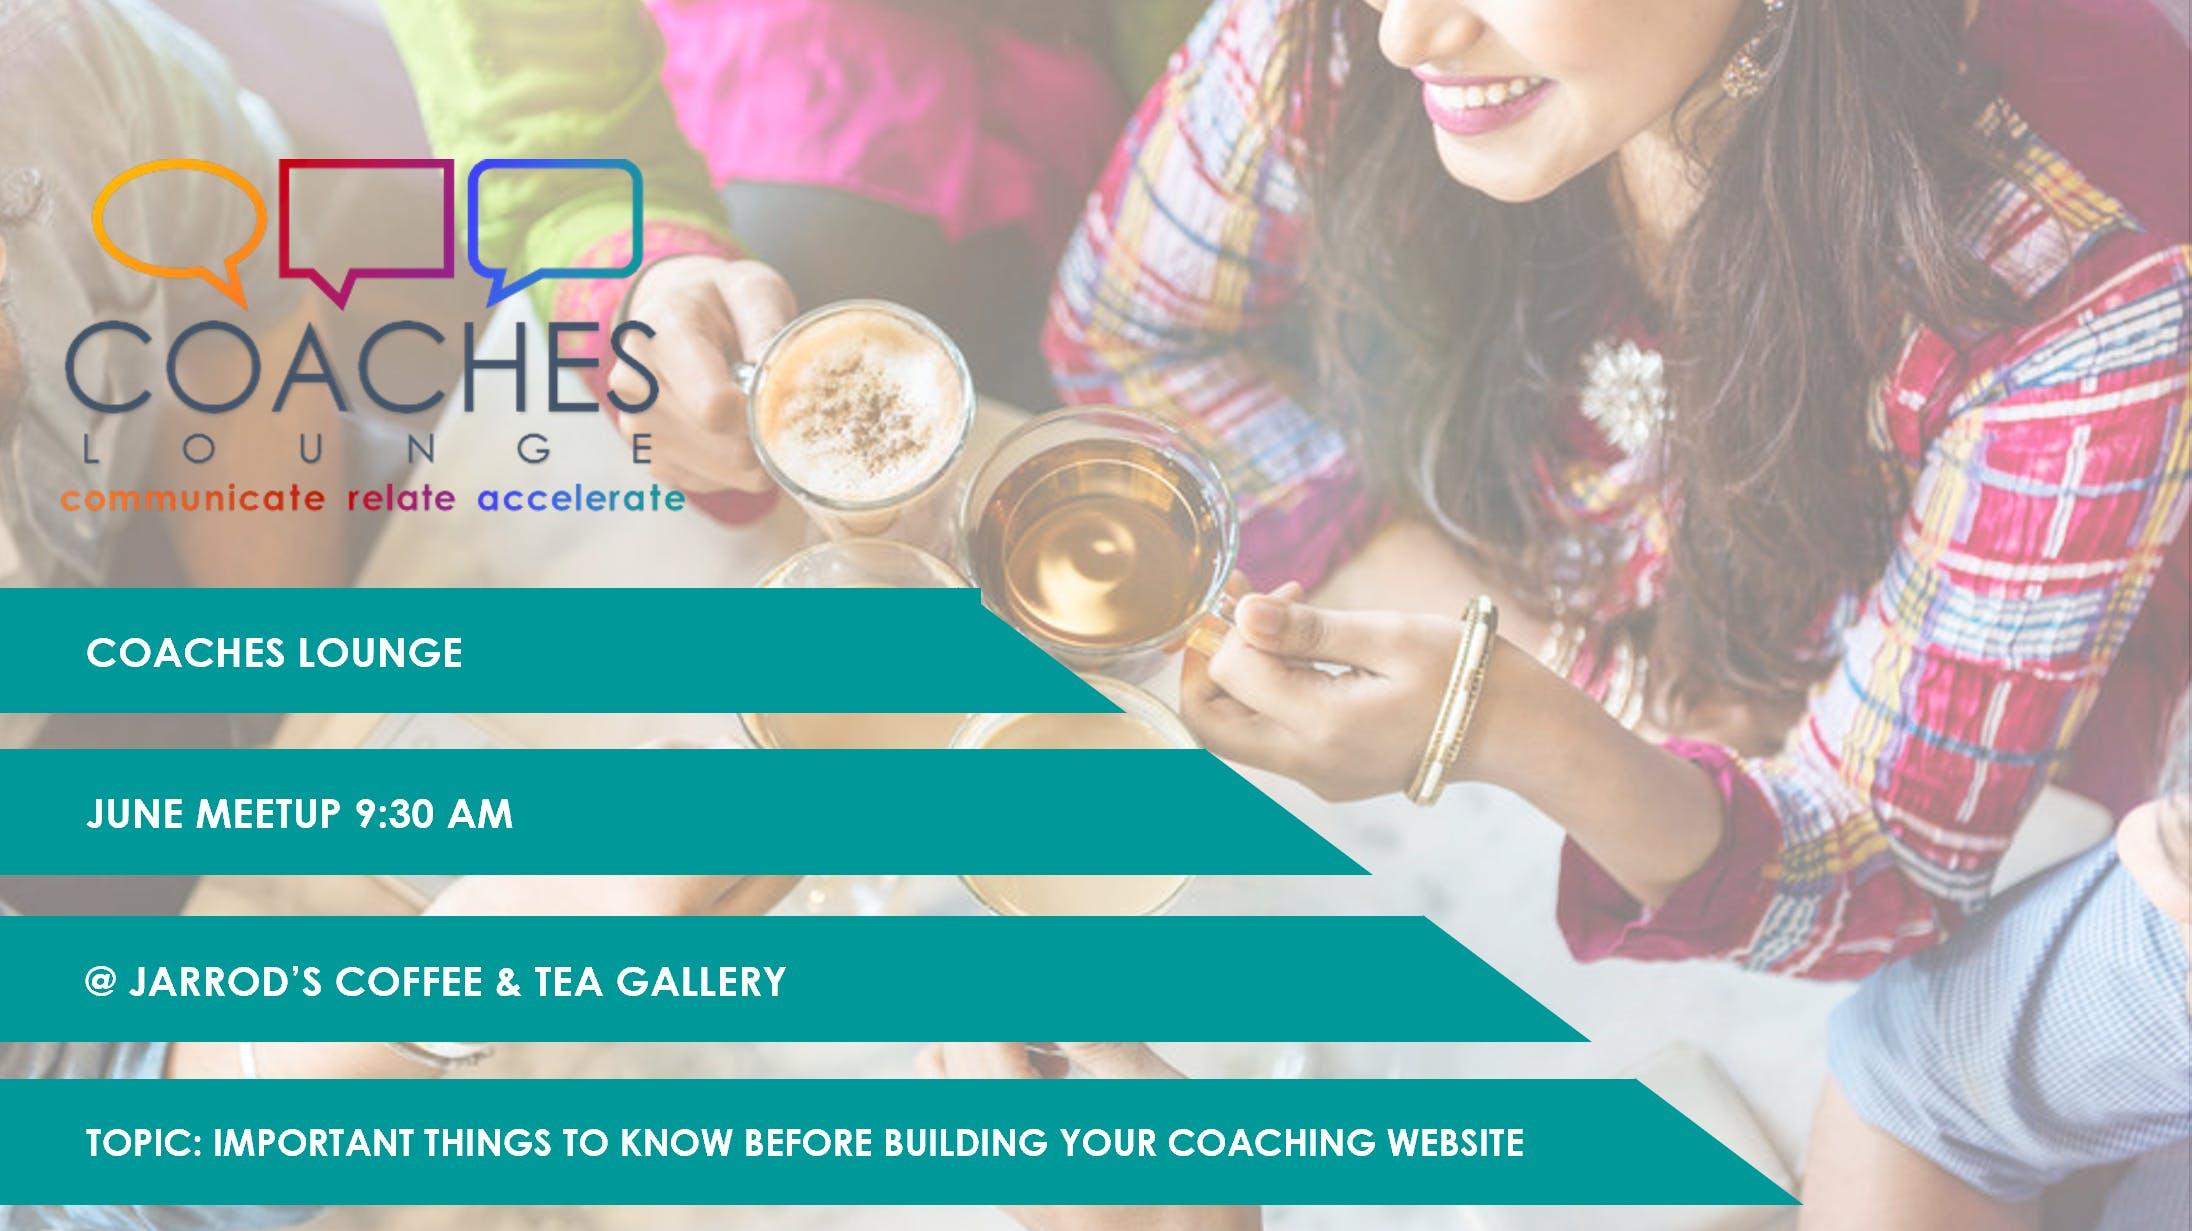 Coaches Lounge June Meetup